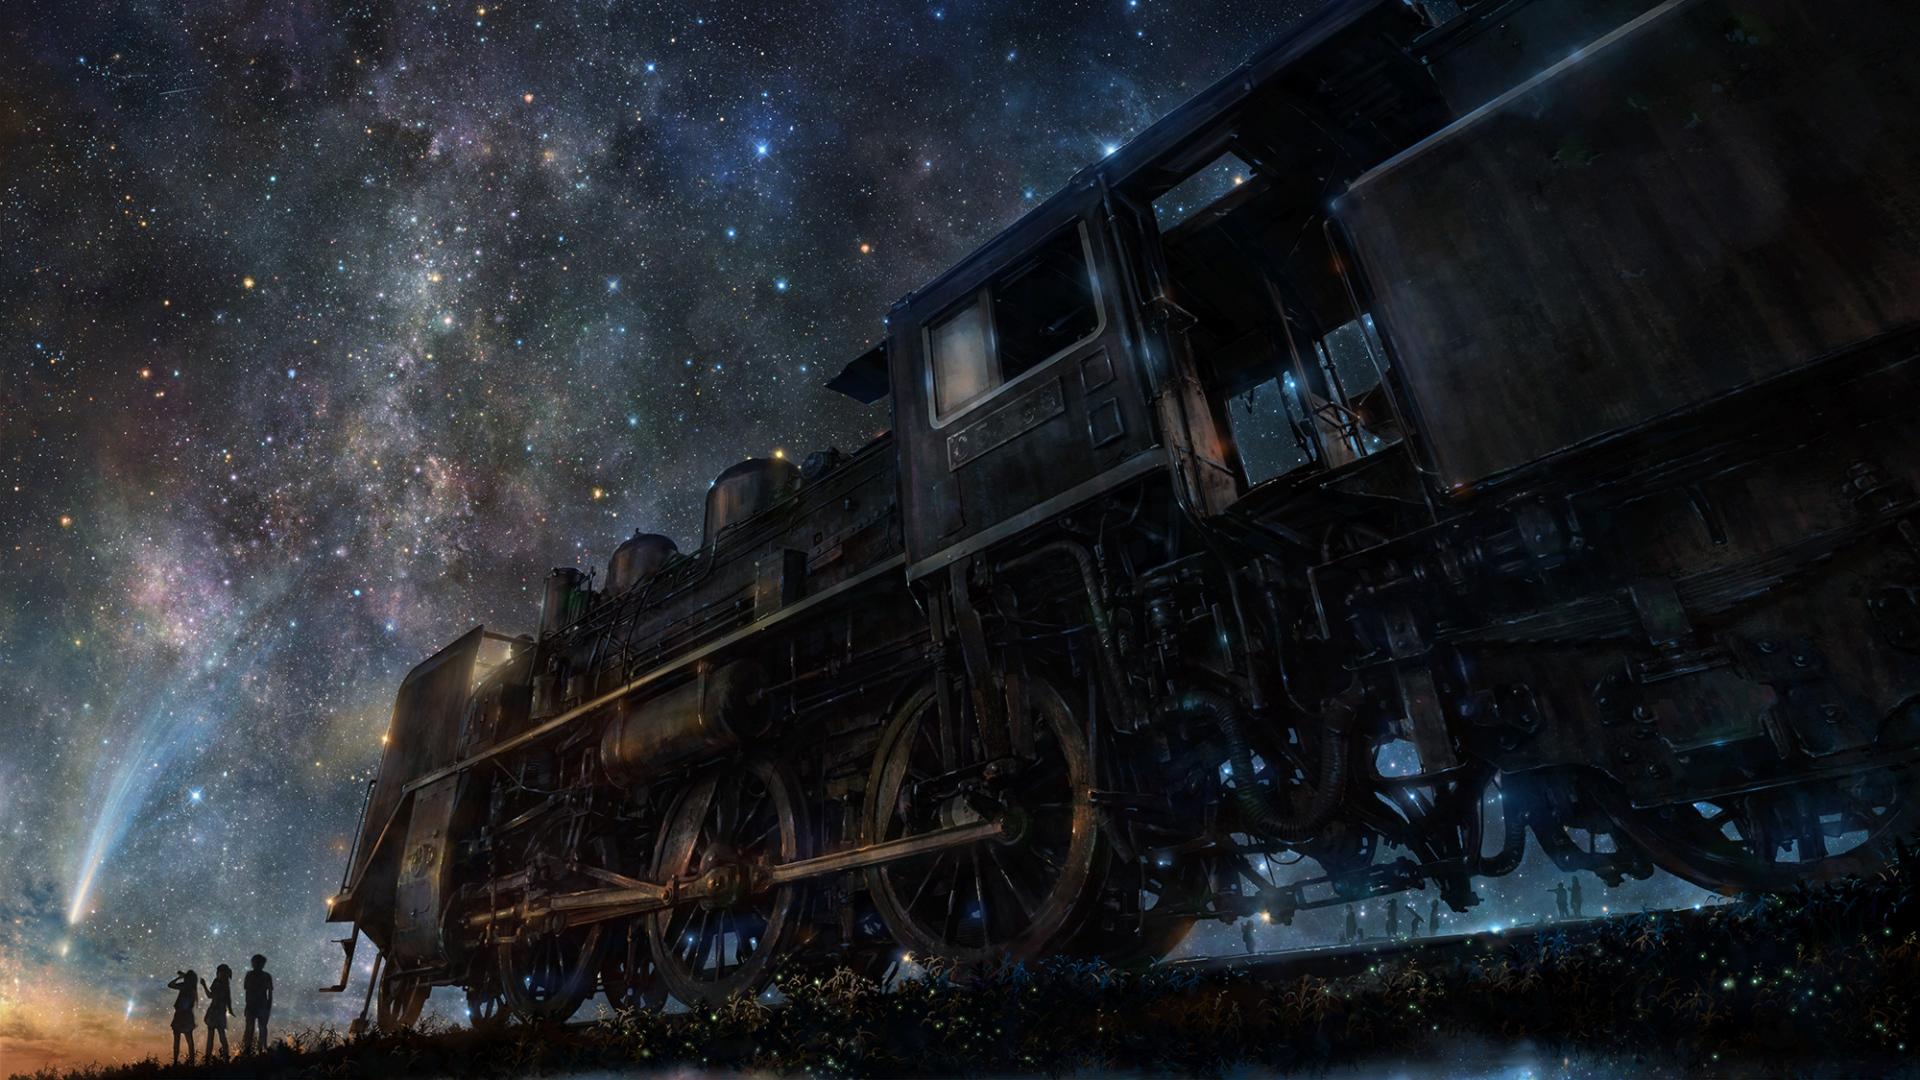 Night Train Starry sky Wallpaper